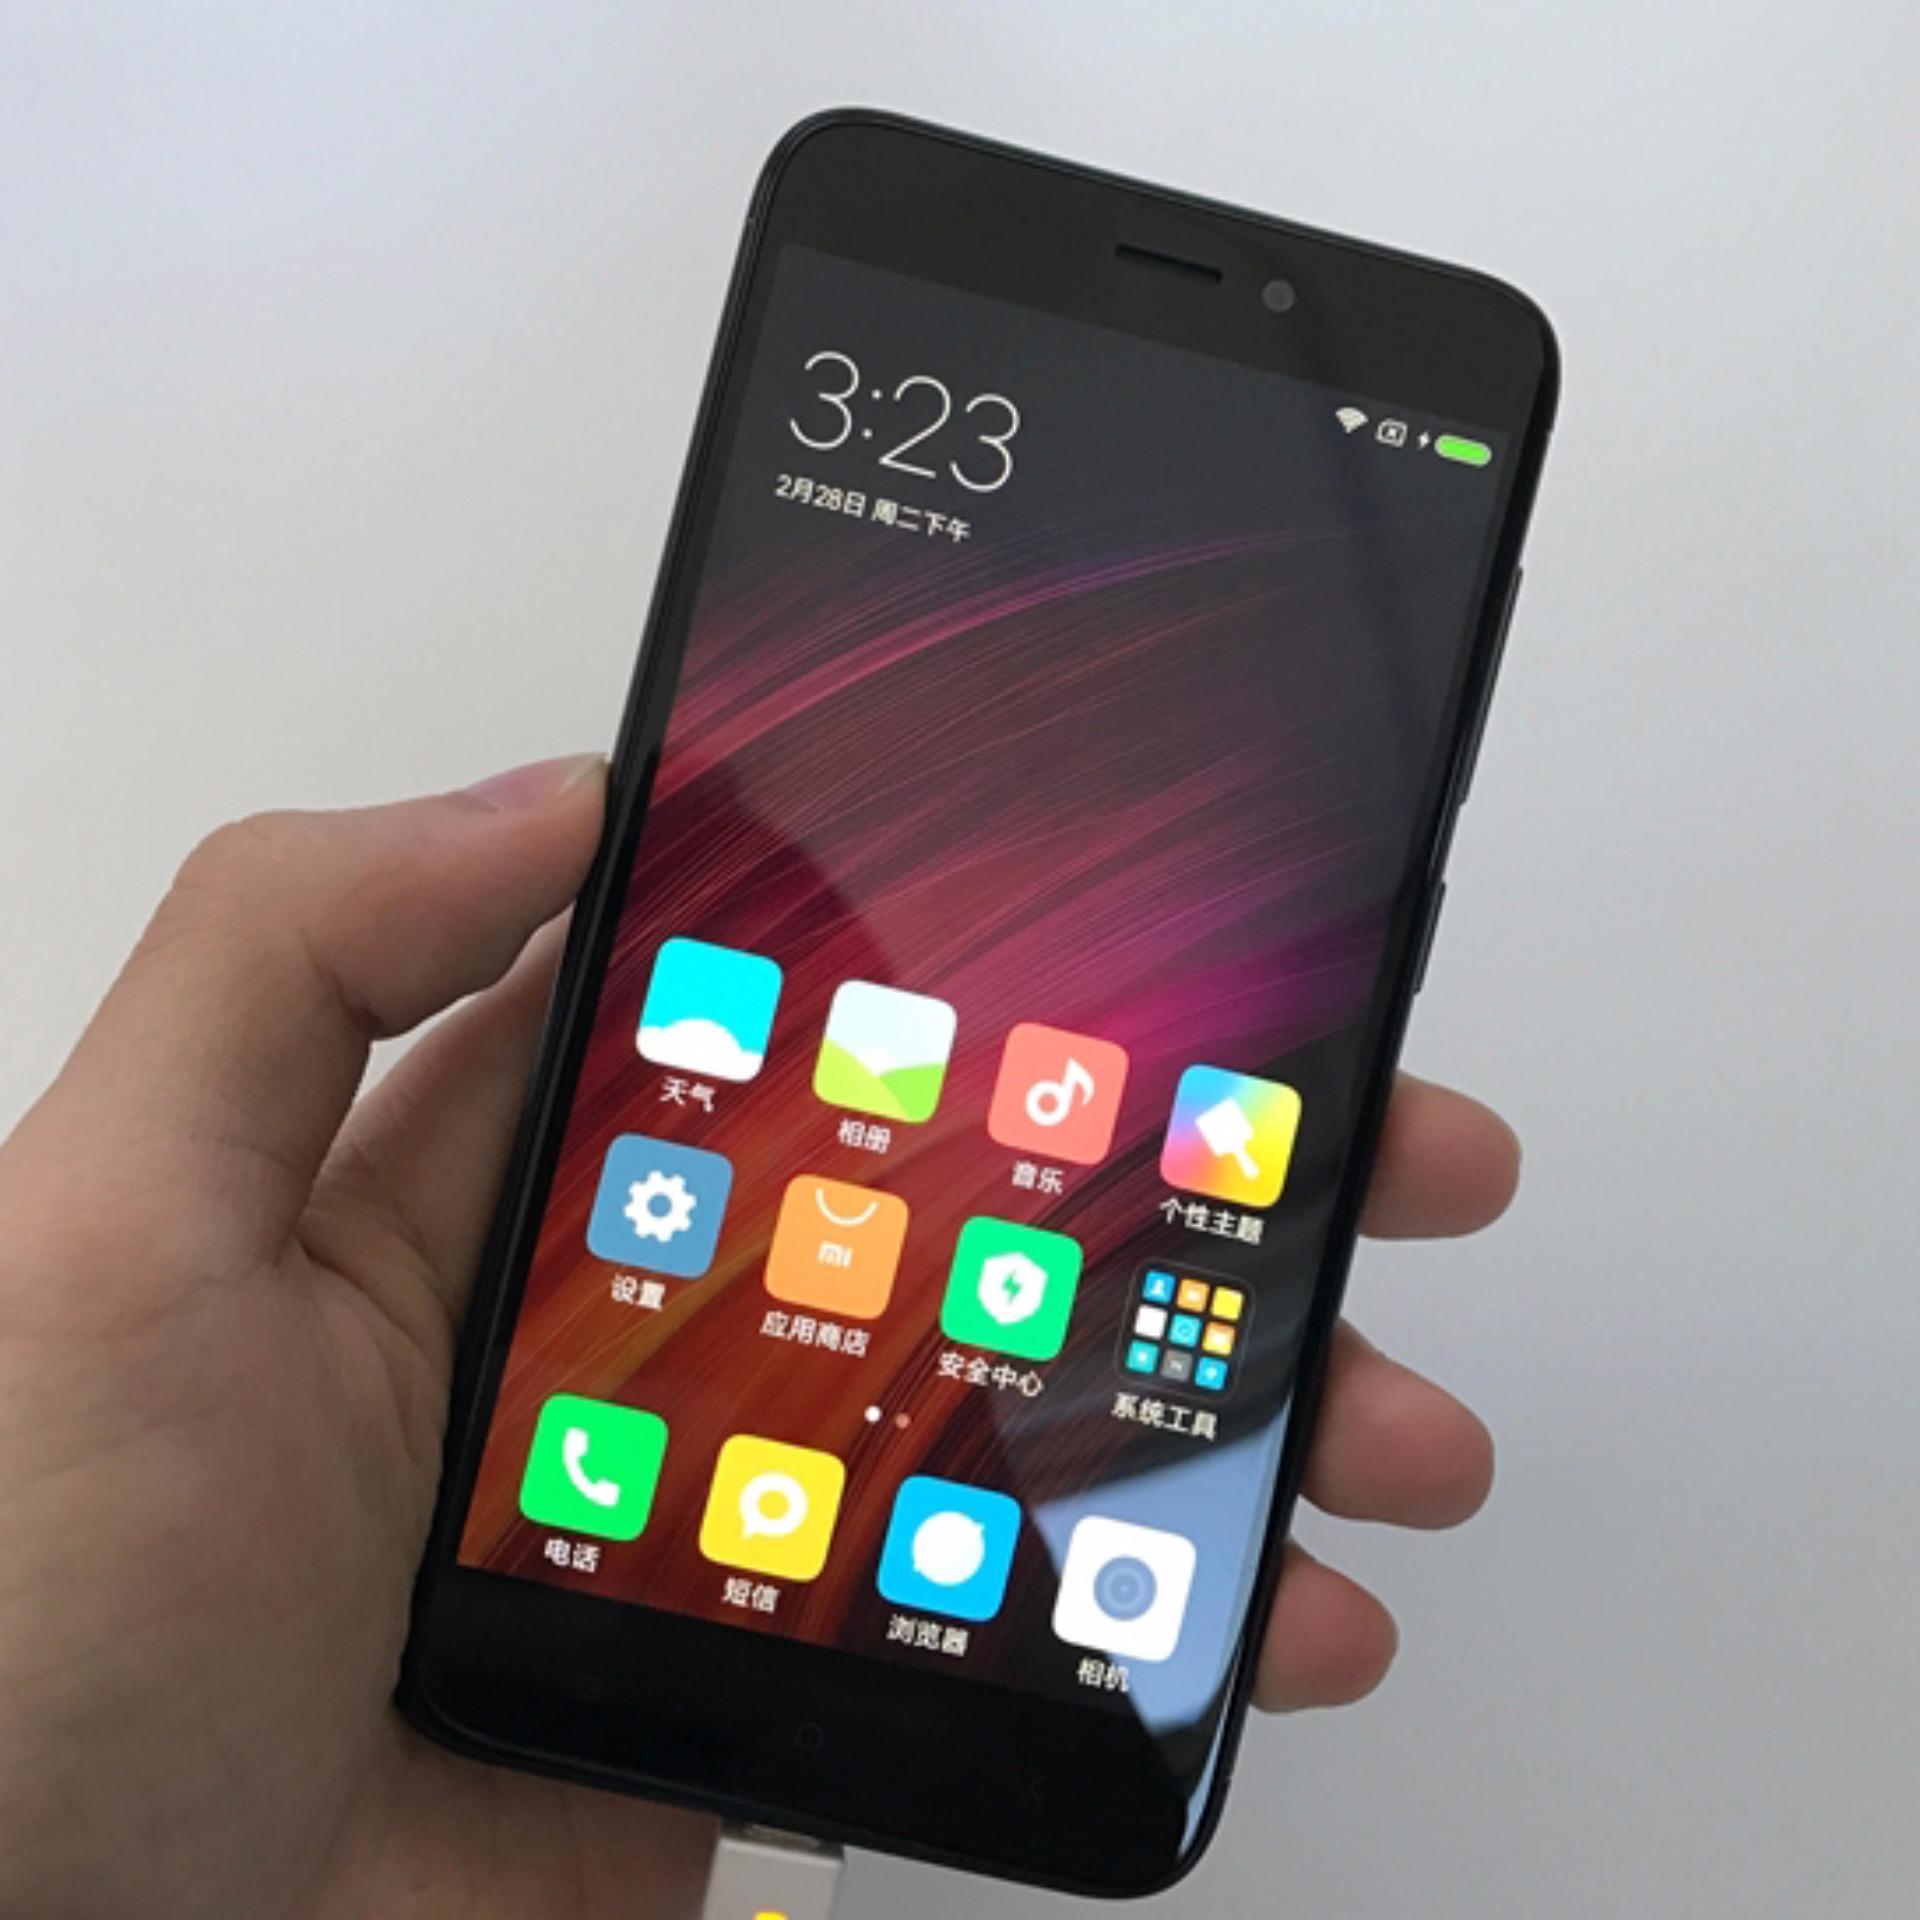 Online Murah Xiaomi Redmi 4x Garansi Resmi Distributor 1 Tahun Note 4 64gb Gold Thn